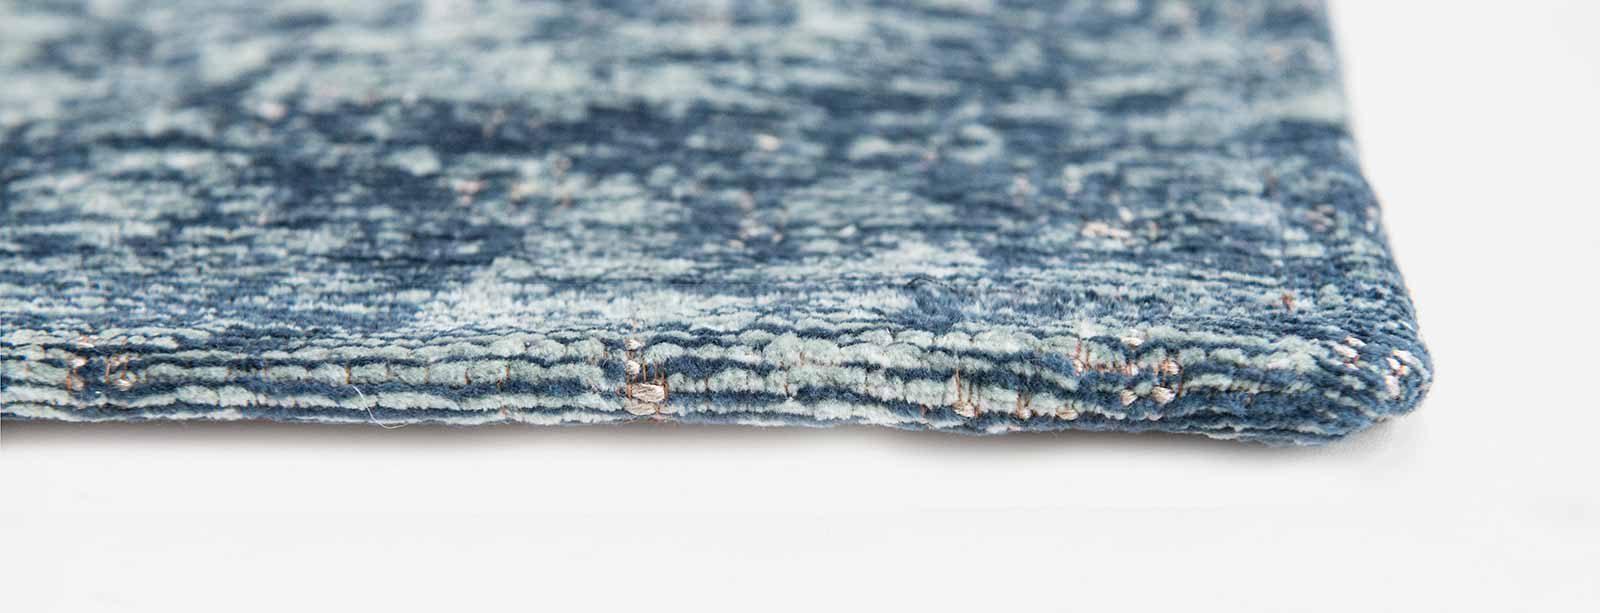 Louis De Poortere rugs Villa Nova LX 8769 Marka Teal side